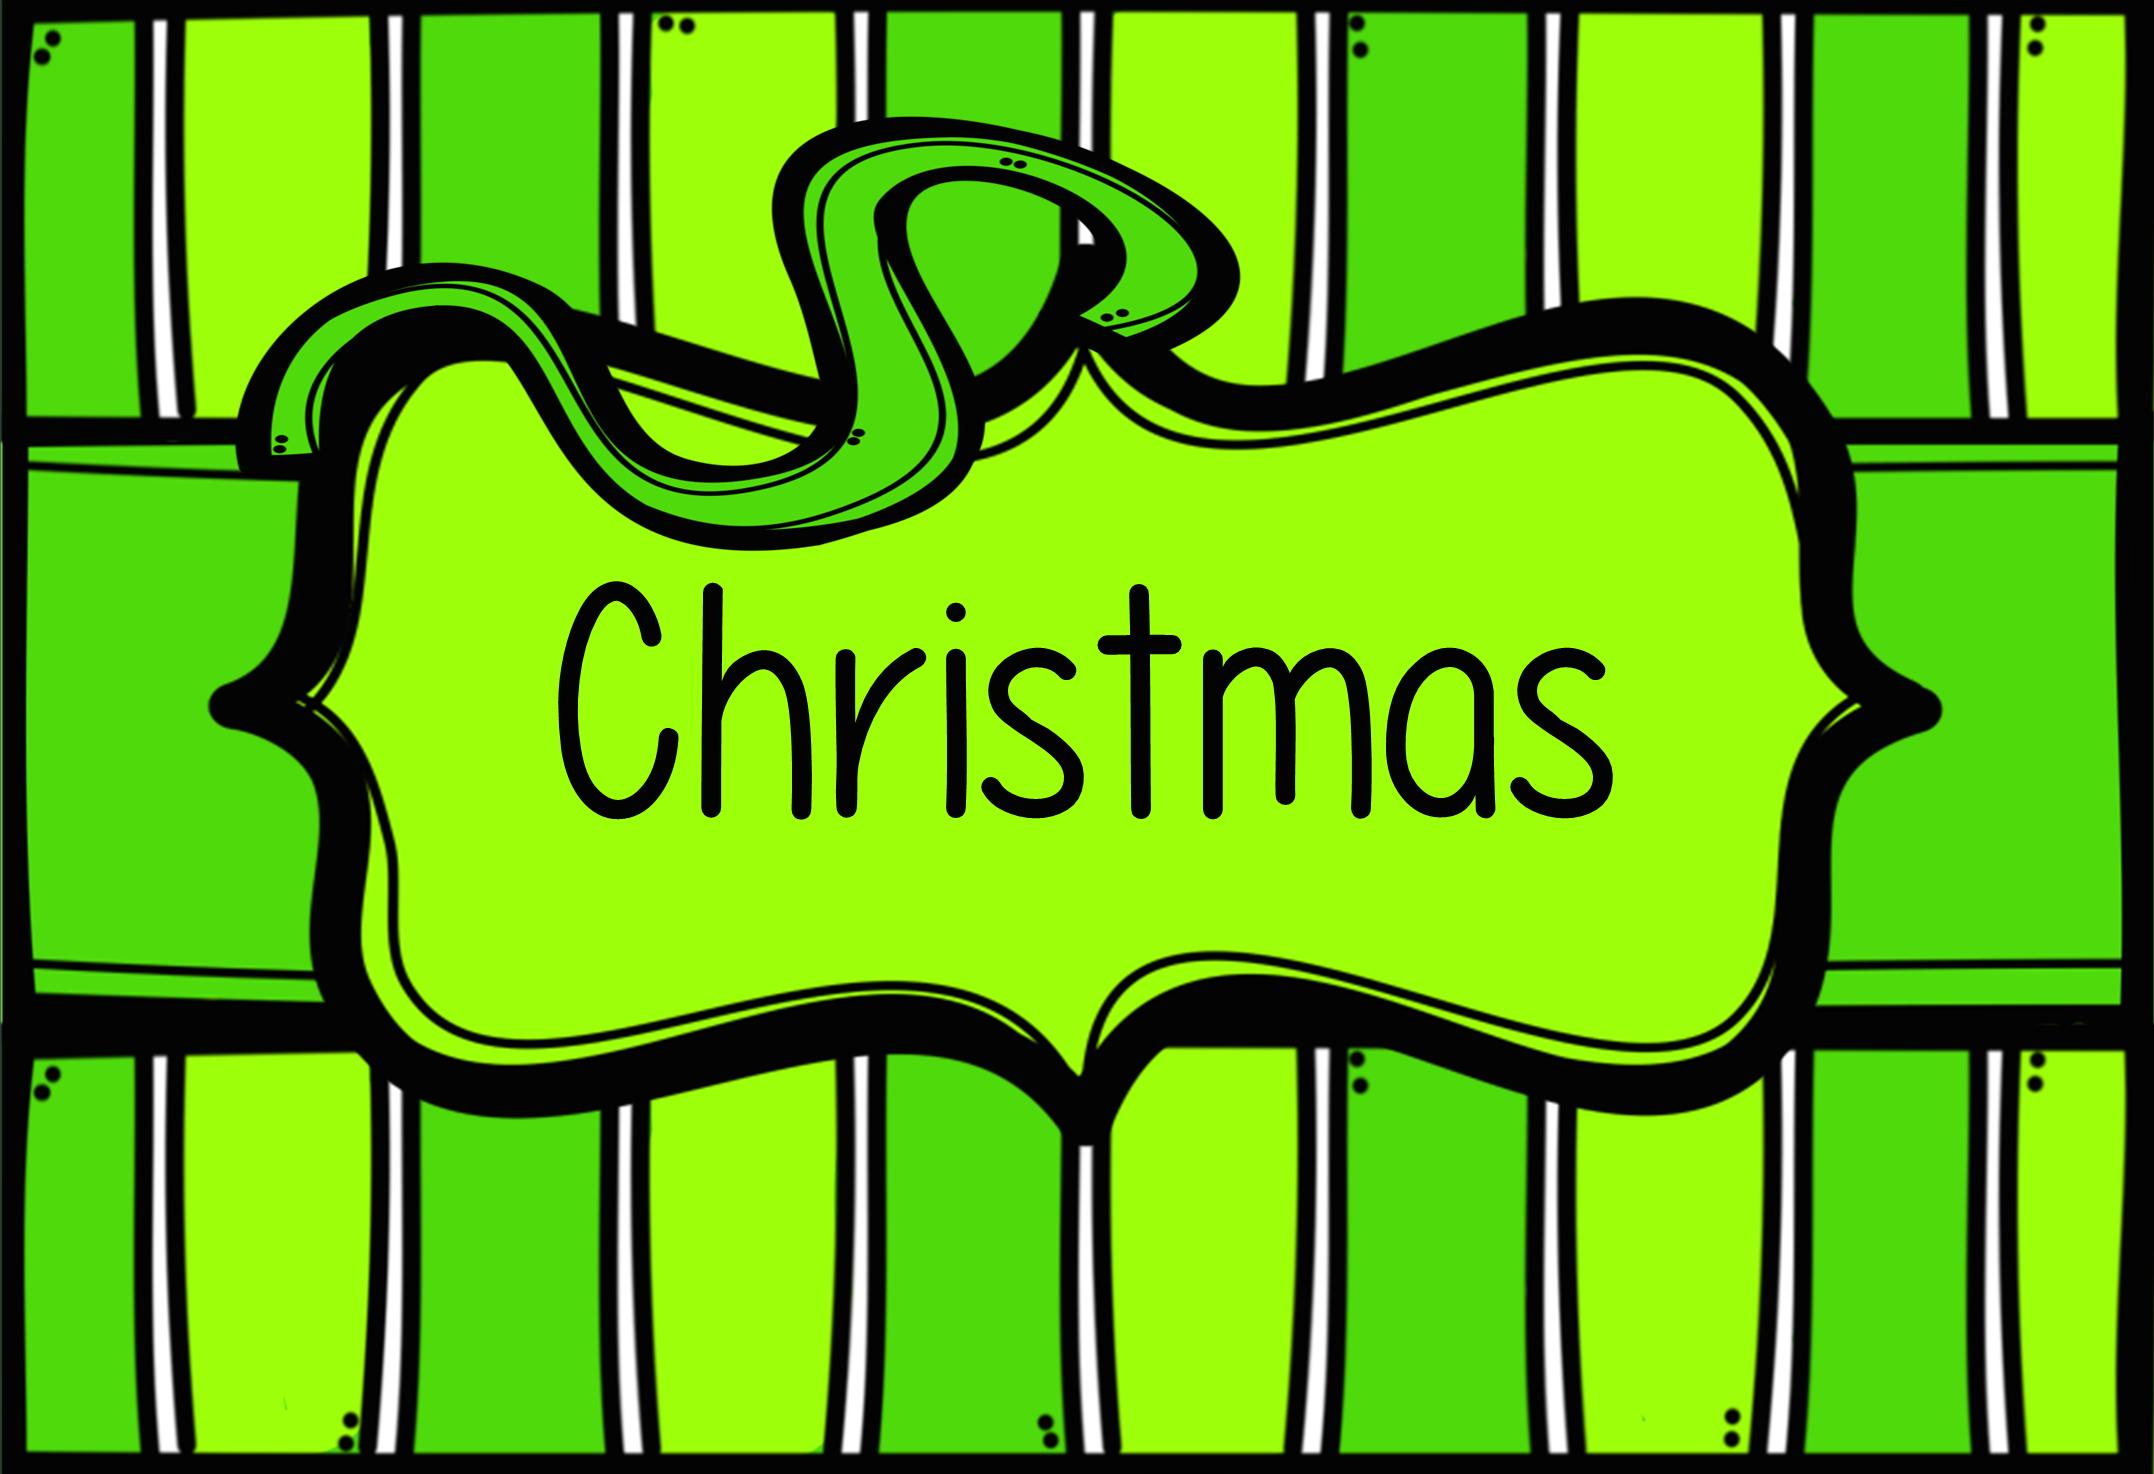 Visit http://www.teacherspayteachers.com/Store/Jen-Rece for more Christmas teaching ideas & downloads!